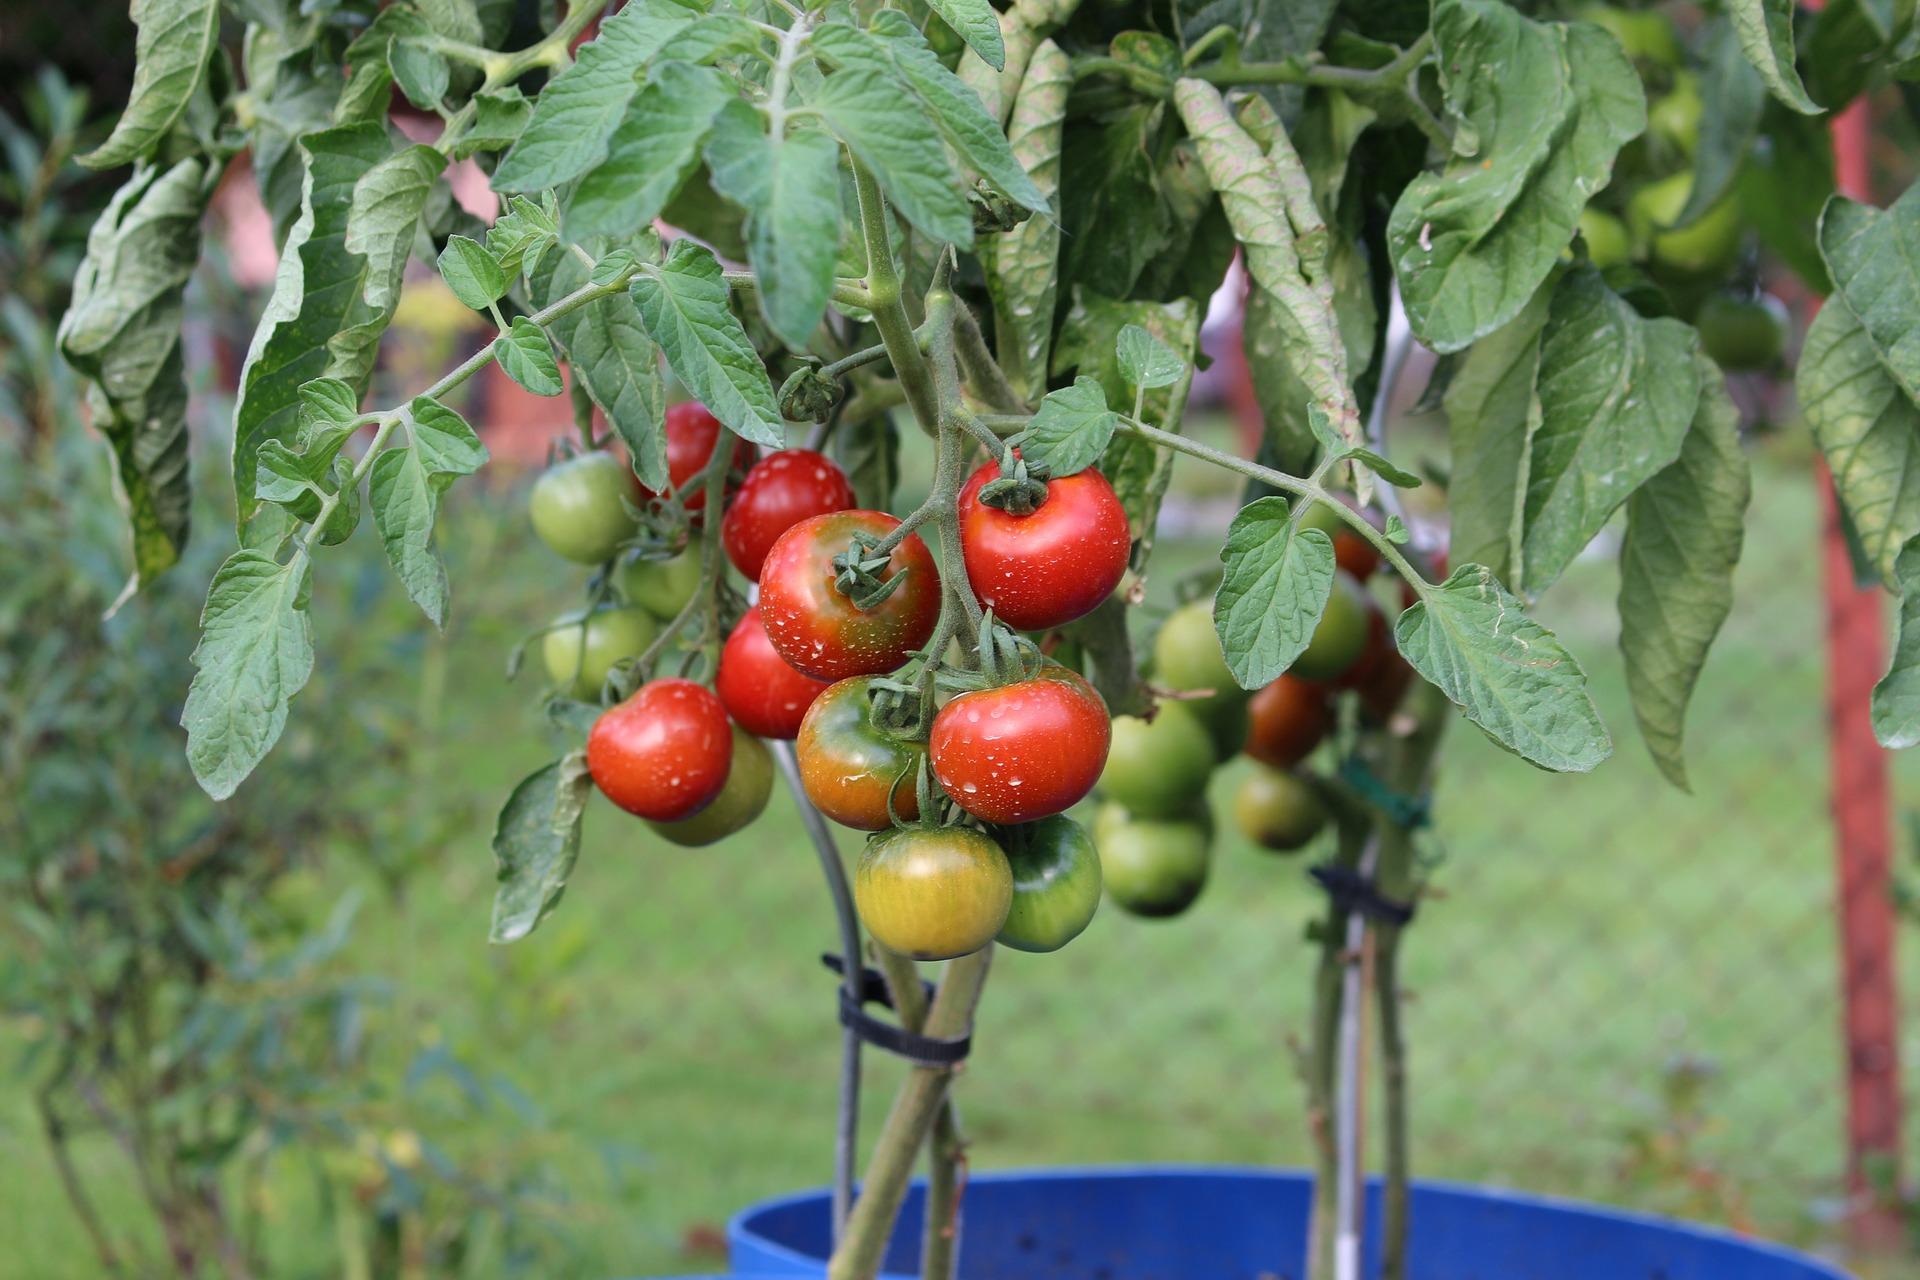 tomatoes-2530823_1920jpg